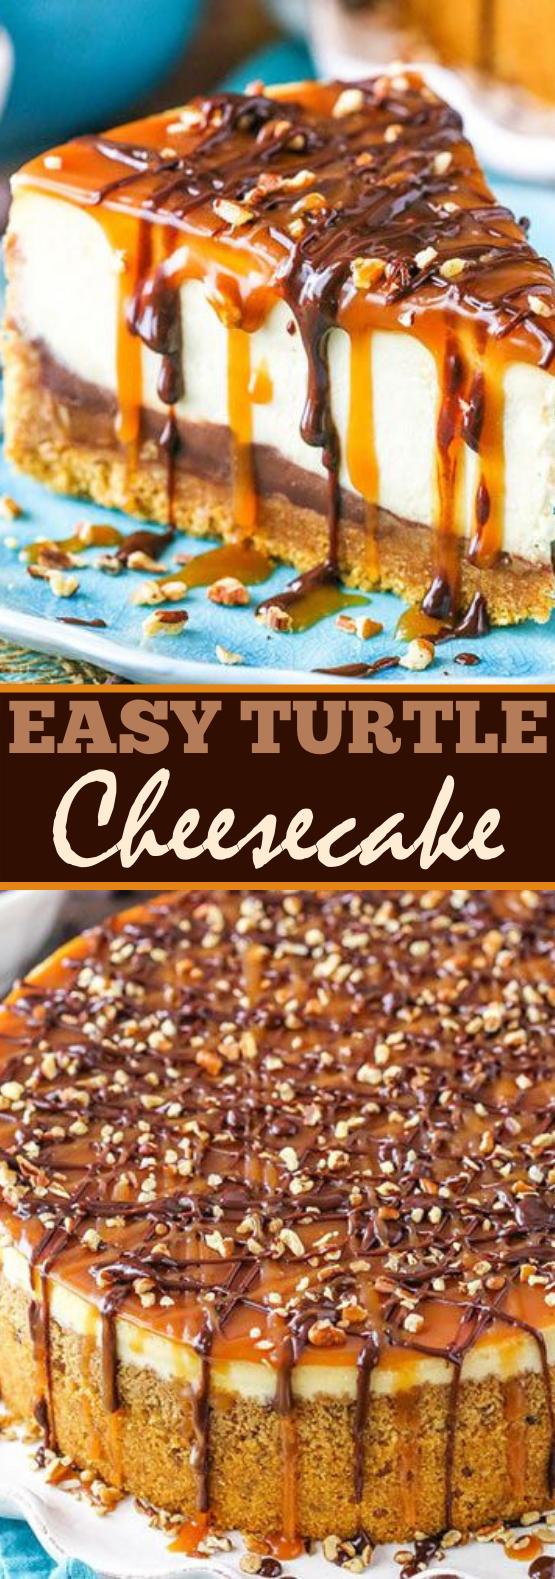 Turtle Cheesecake #cake #desserts